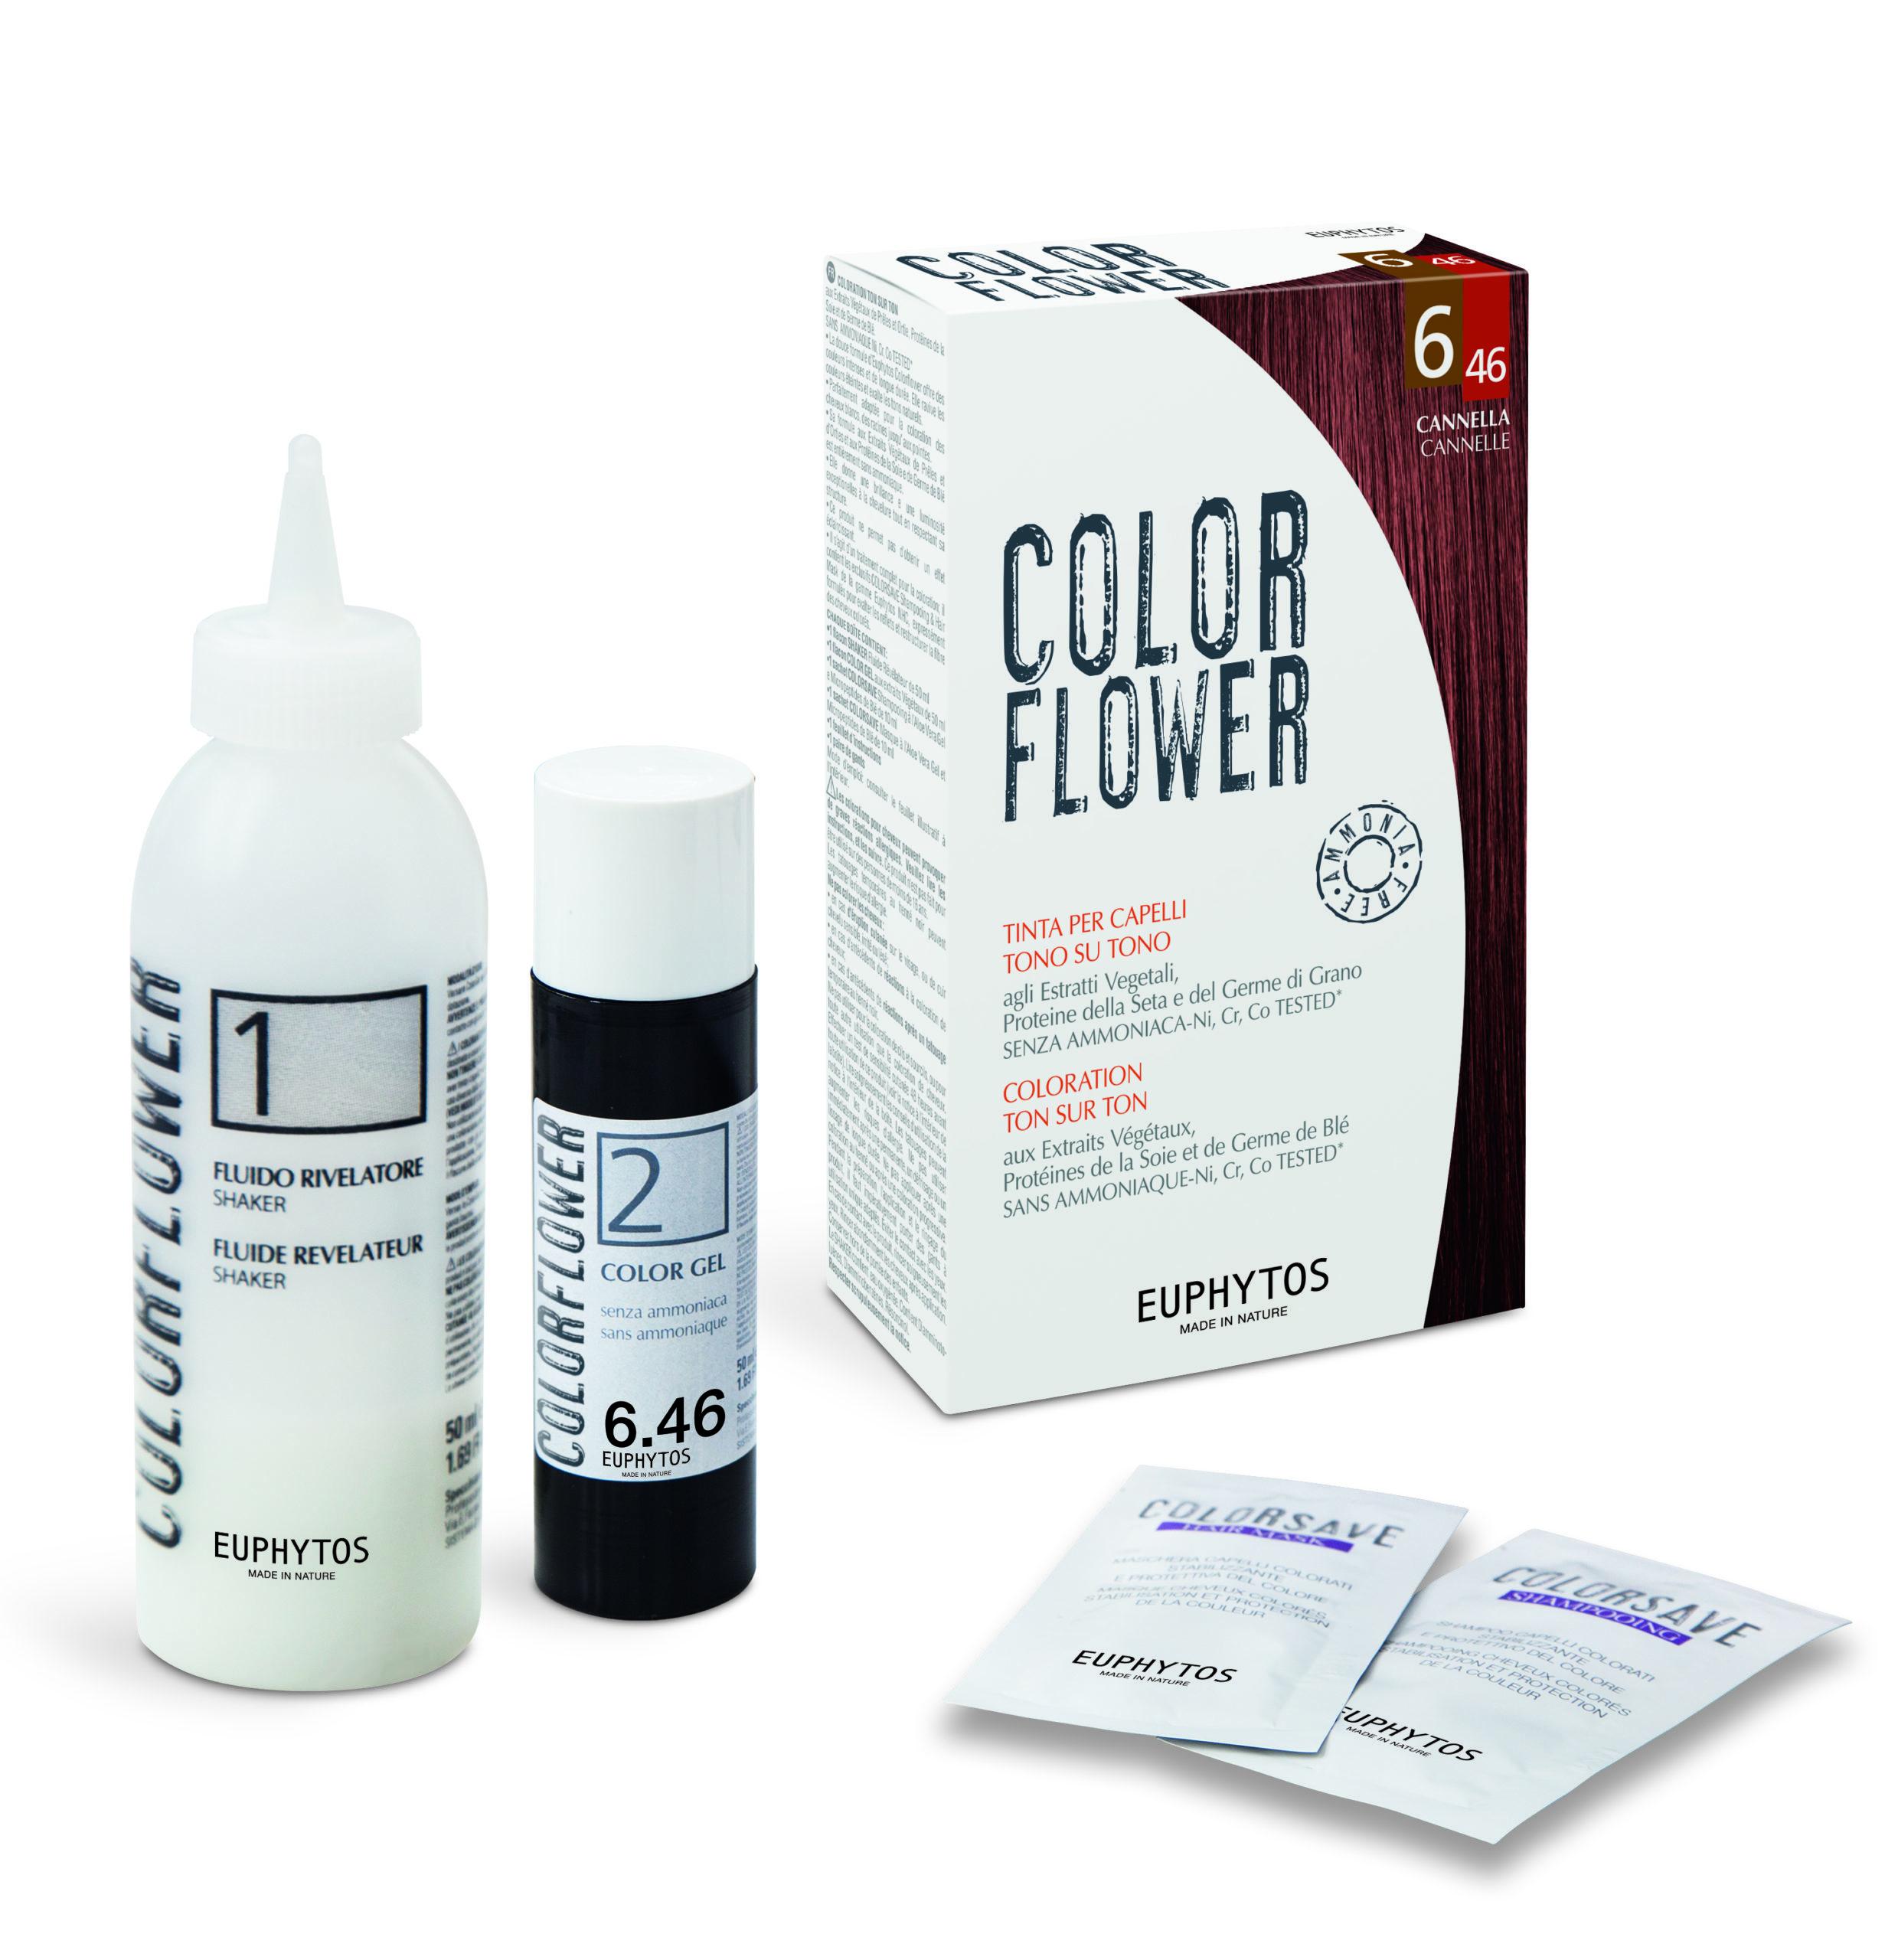 Pack-Color-Flower-6_46-scaled.jpg